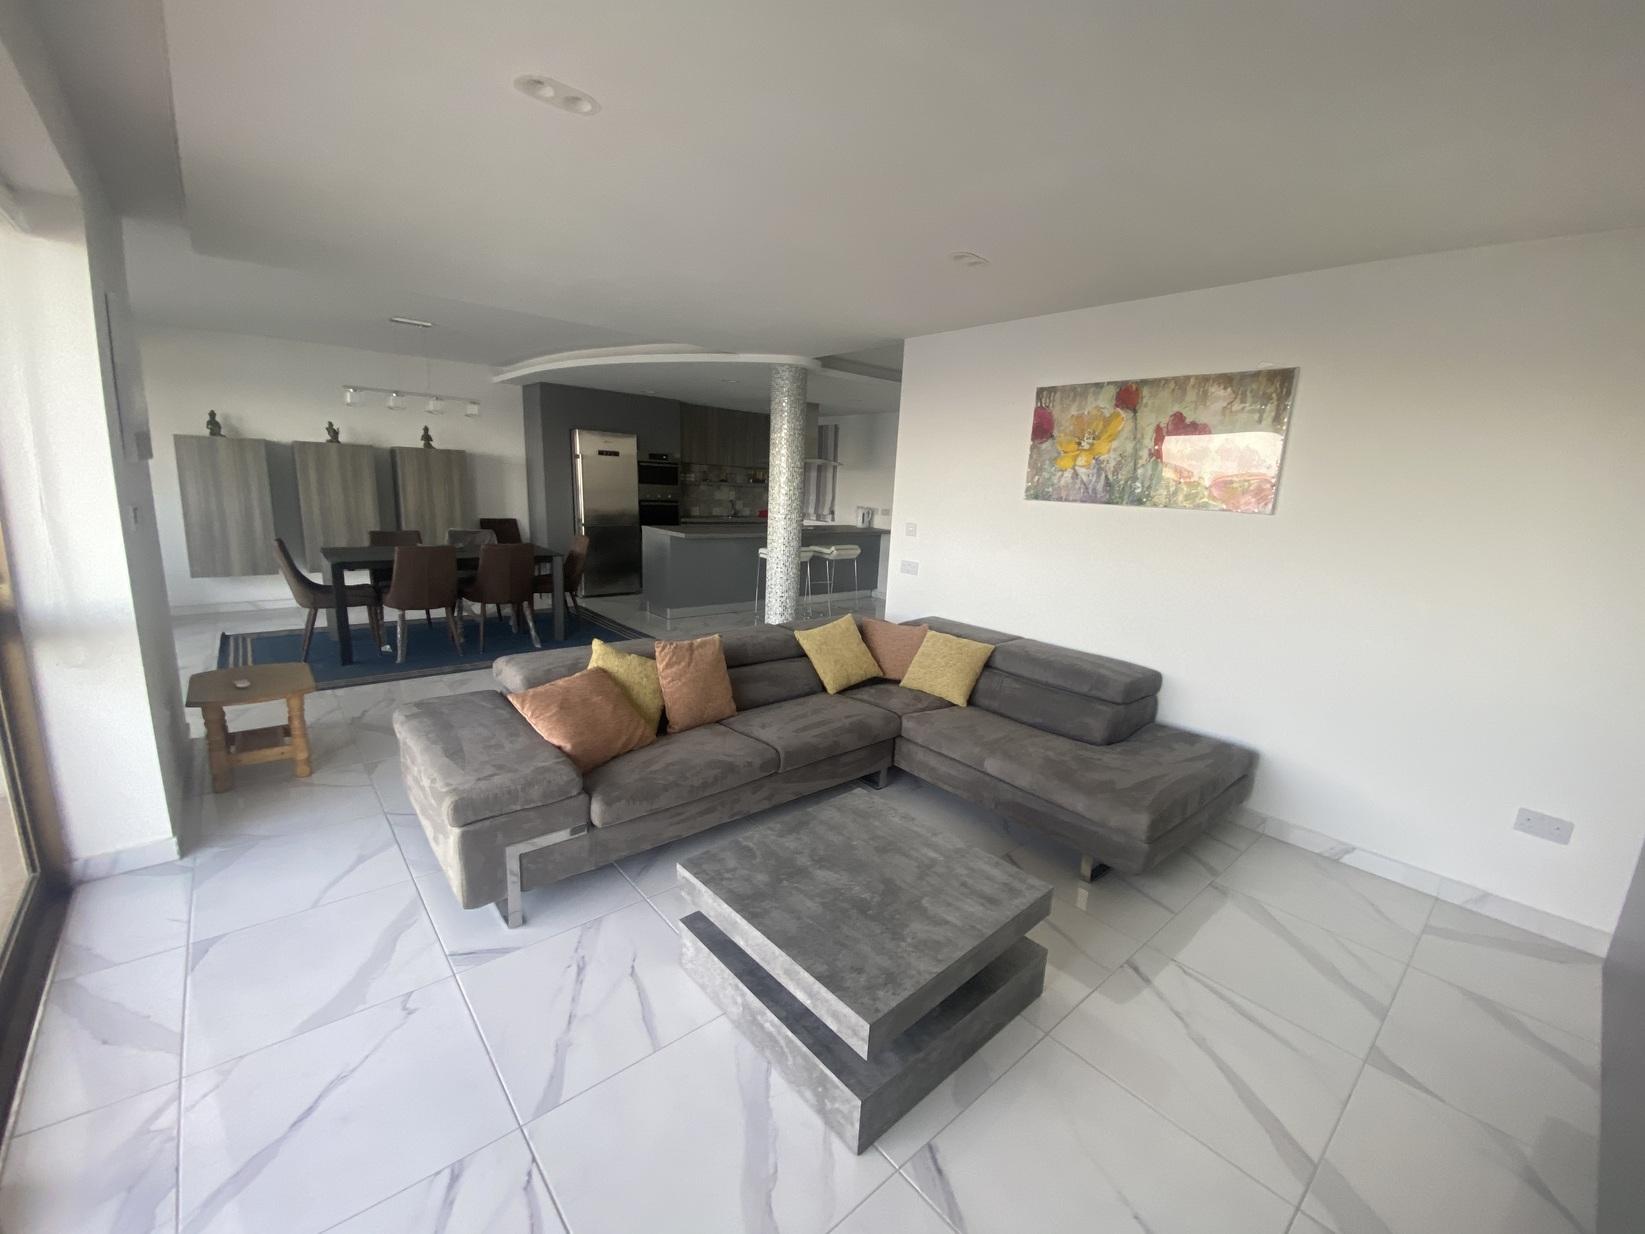 3 bed Apartment For Rent in Qawra, Qawra - thumb 7